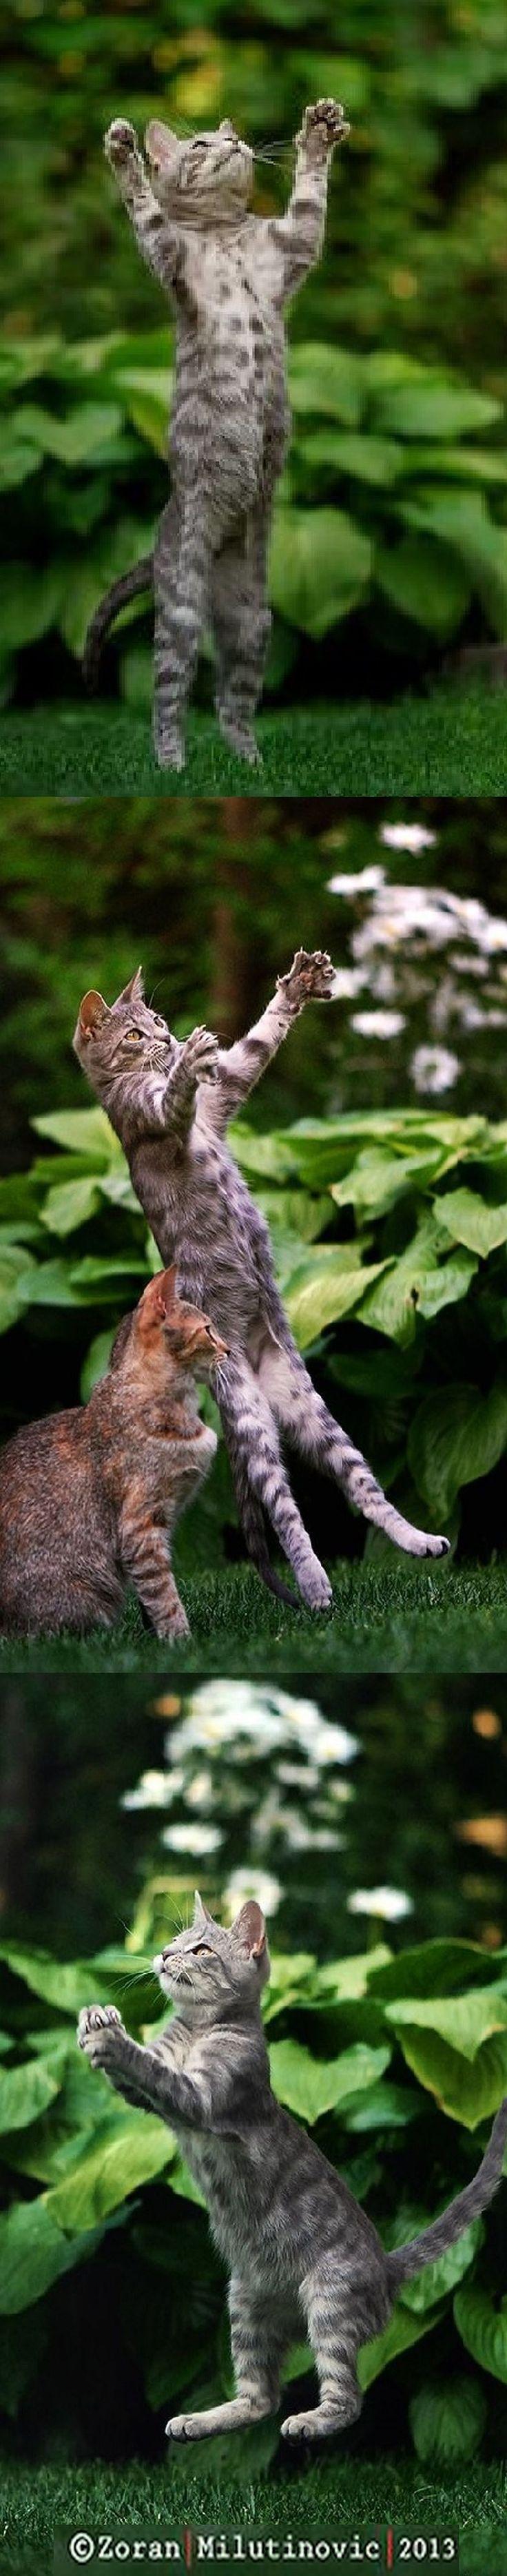 JUMP FLIGHT and LANDING ☀   #photos by ZoranPhoto on DeviantArt #cat cats kitten kitty animal pet nature amazing omg cute